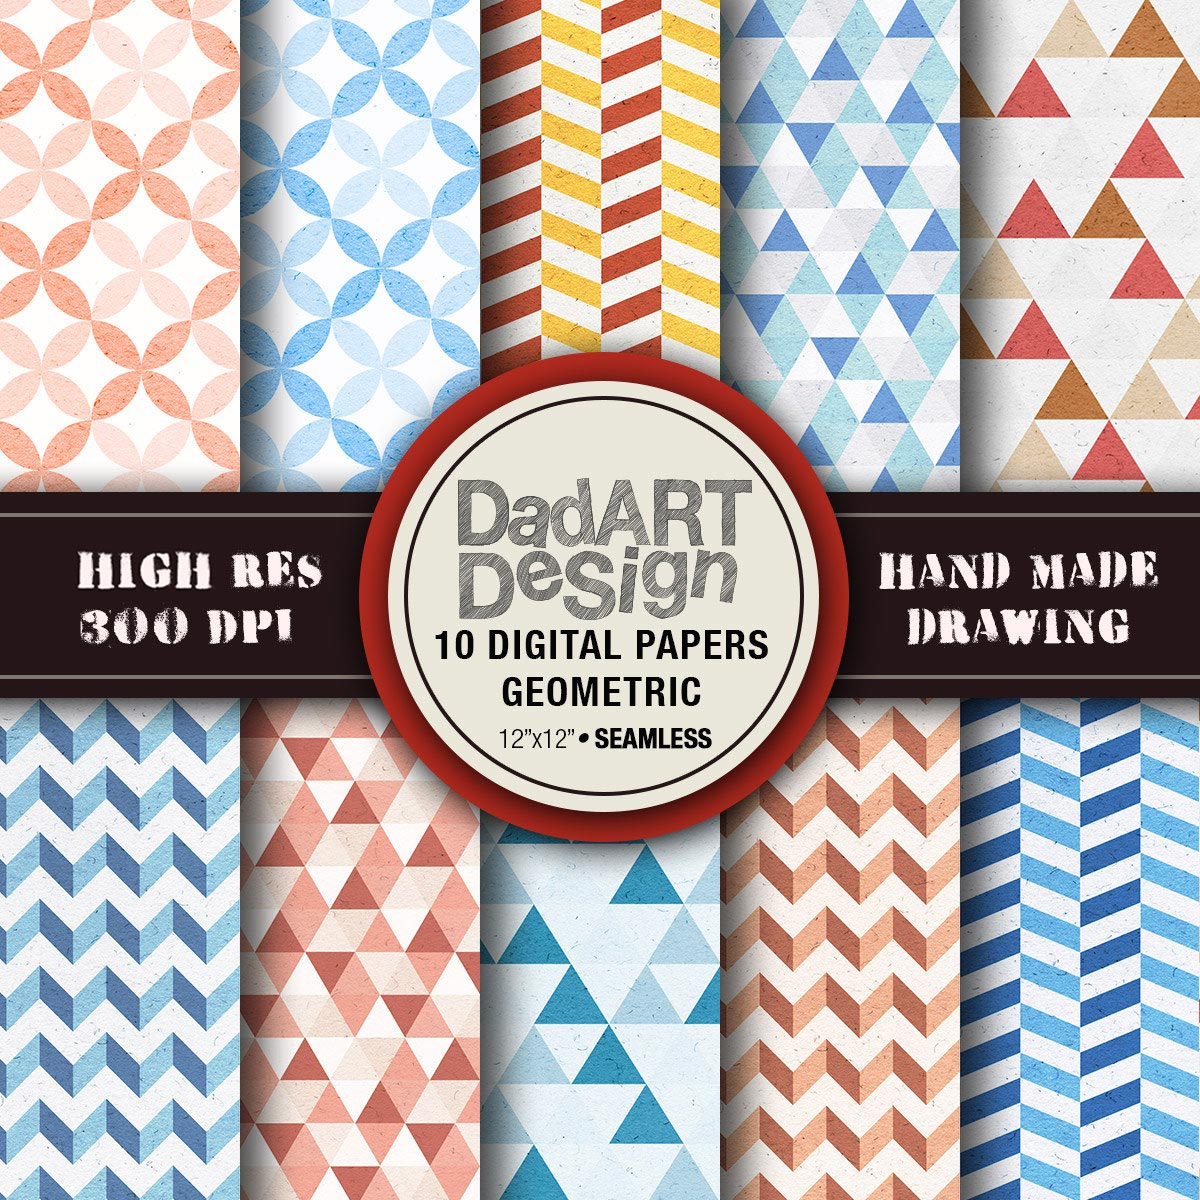 10 Geometric Patterns Digital Paper pack